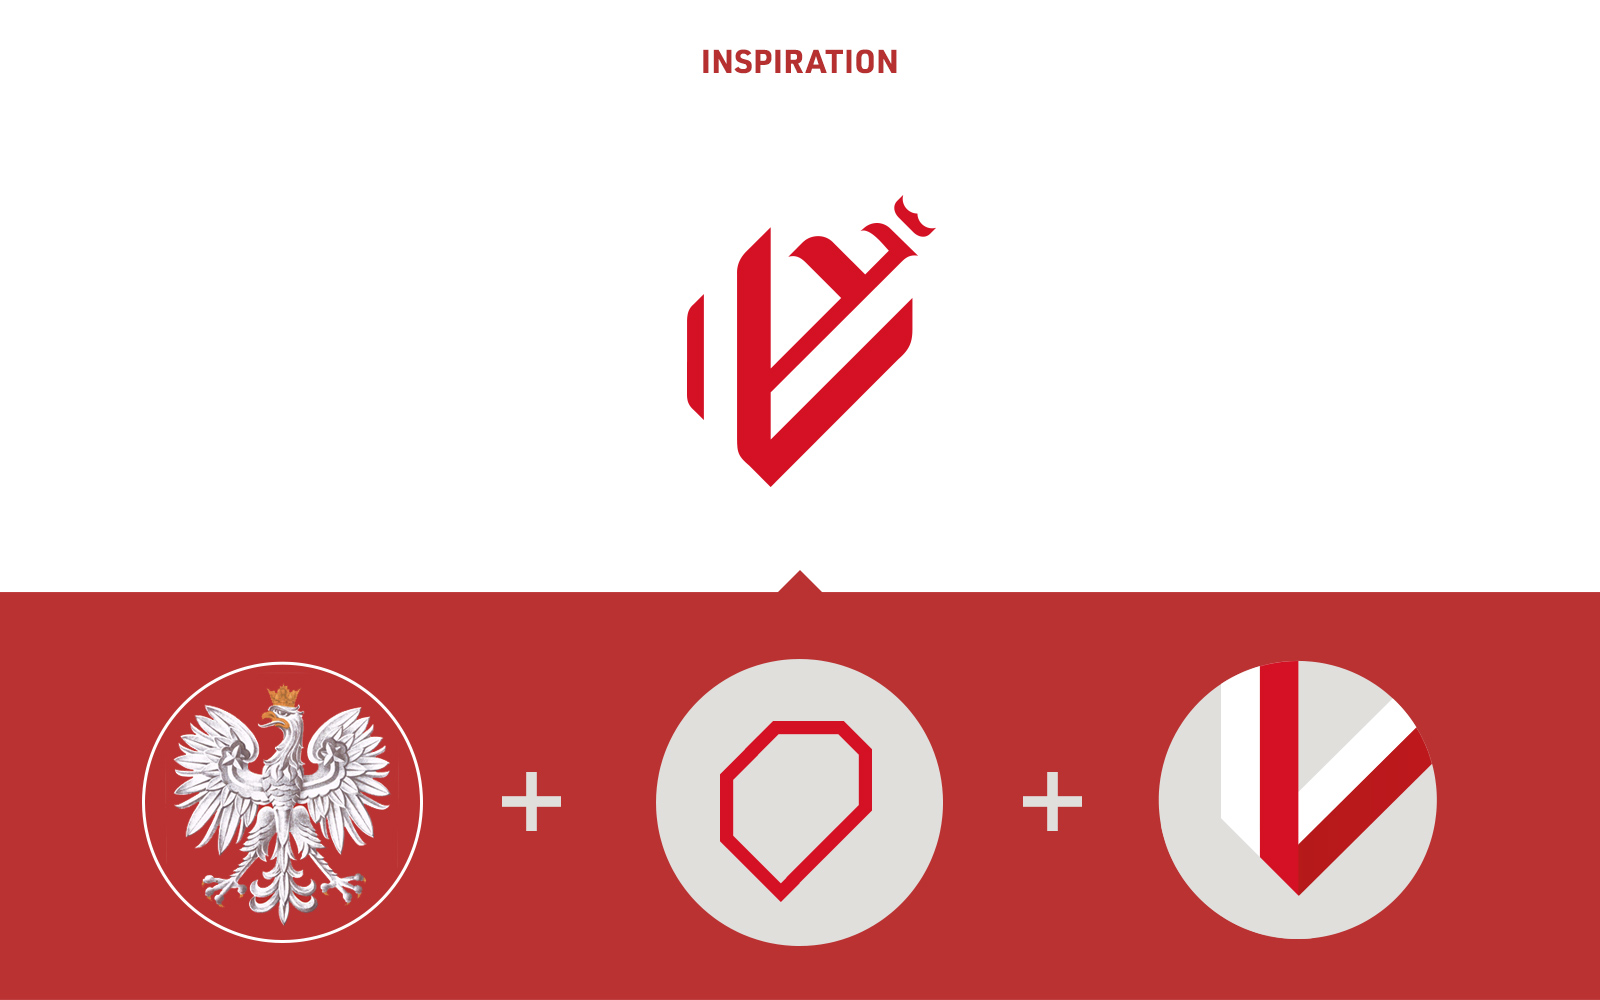 Polskielogo inspiration